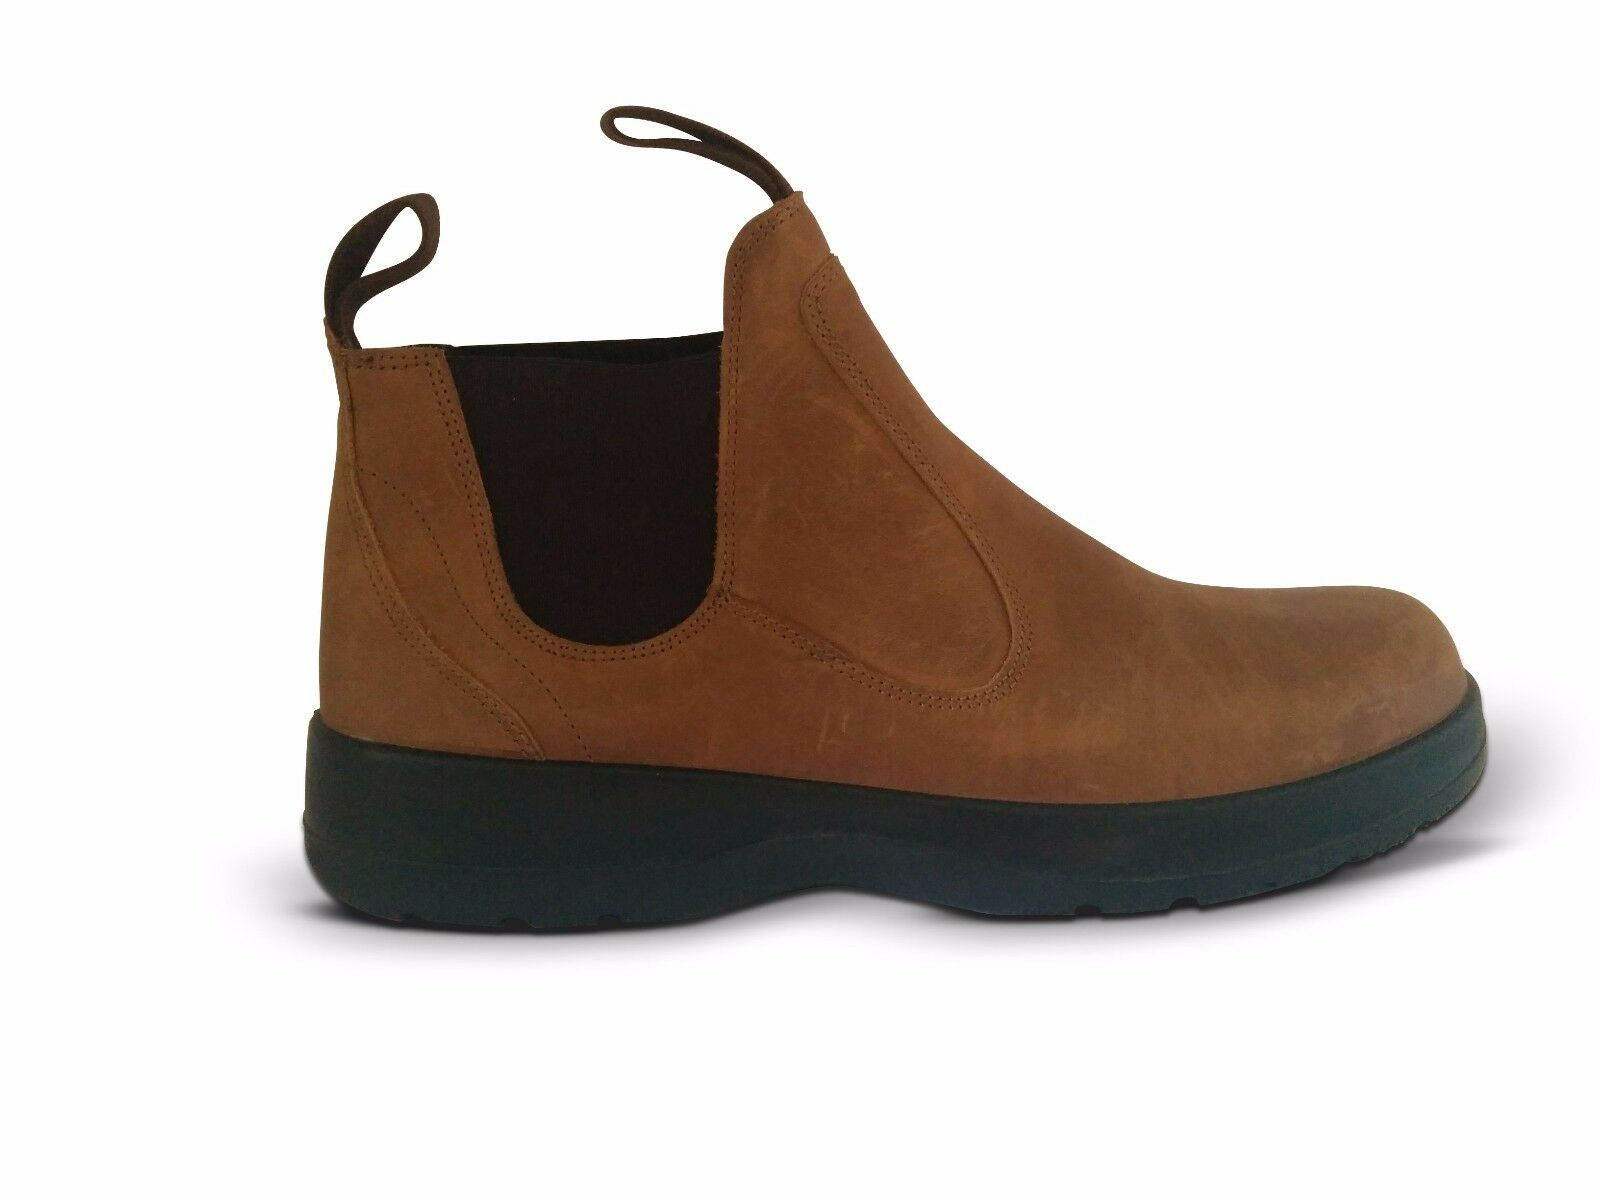 Naot Iguana Iguana Iguana botas Mujer Cuero Trabajo Zapatos Abotinados plana Slip On Cuña De Diapositivas Nuevo  Ven a elegir tu propio estilo deportivo.